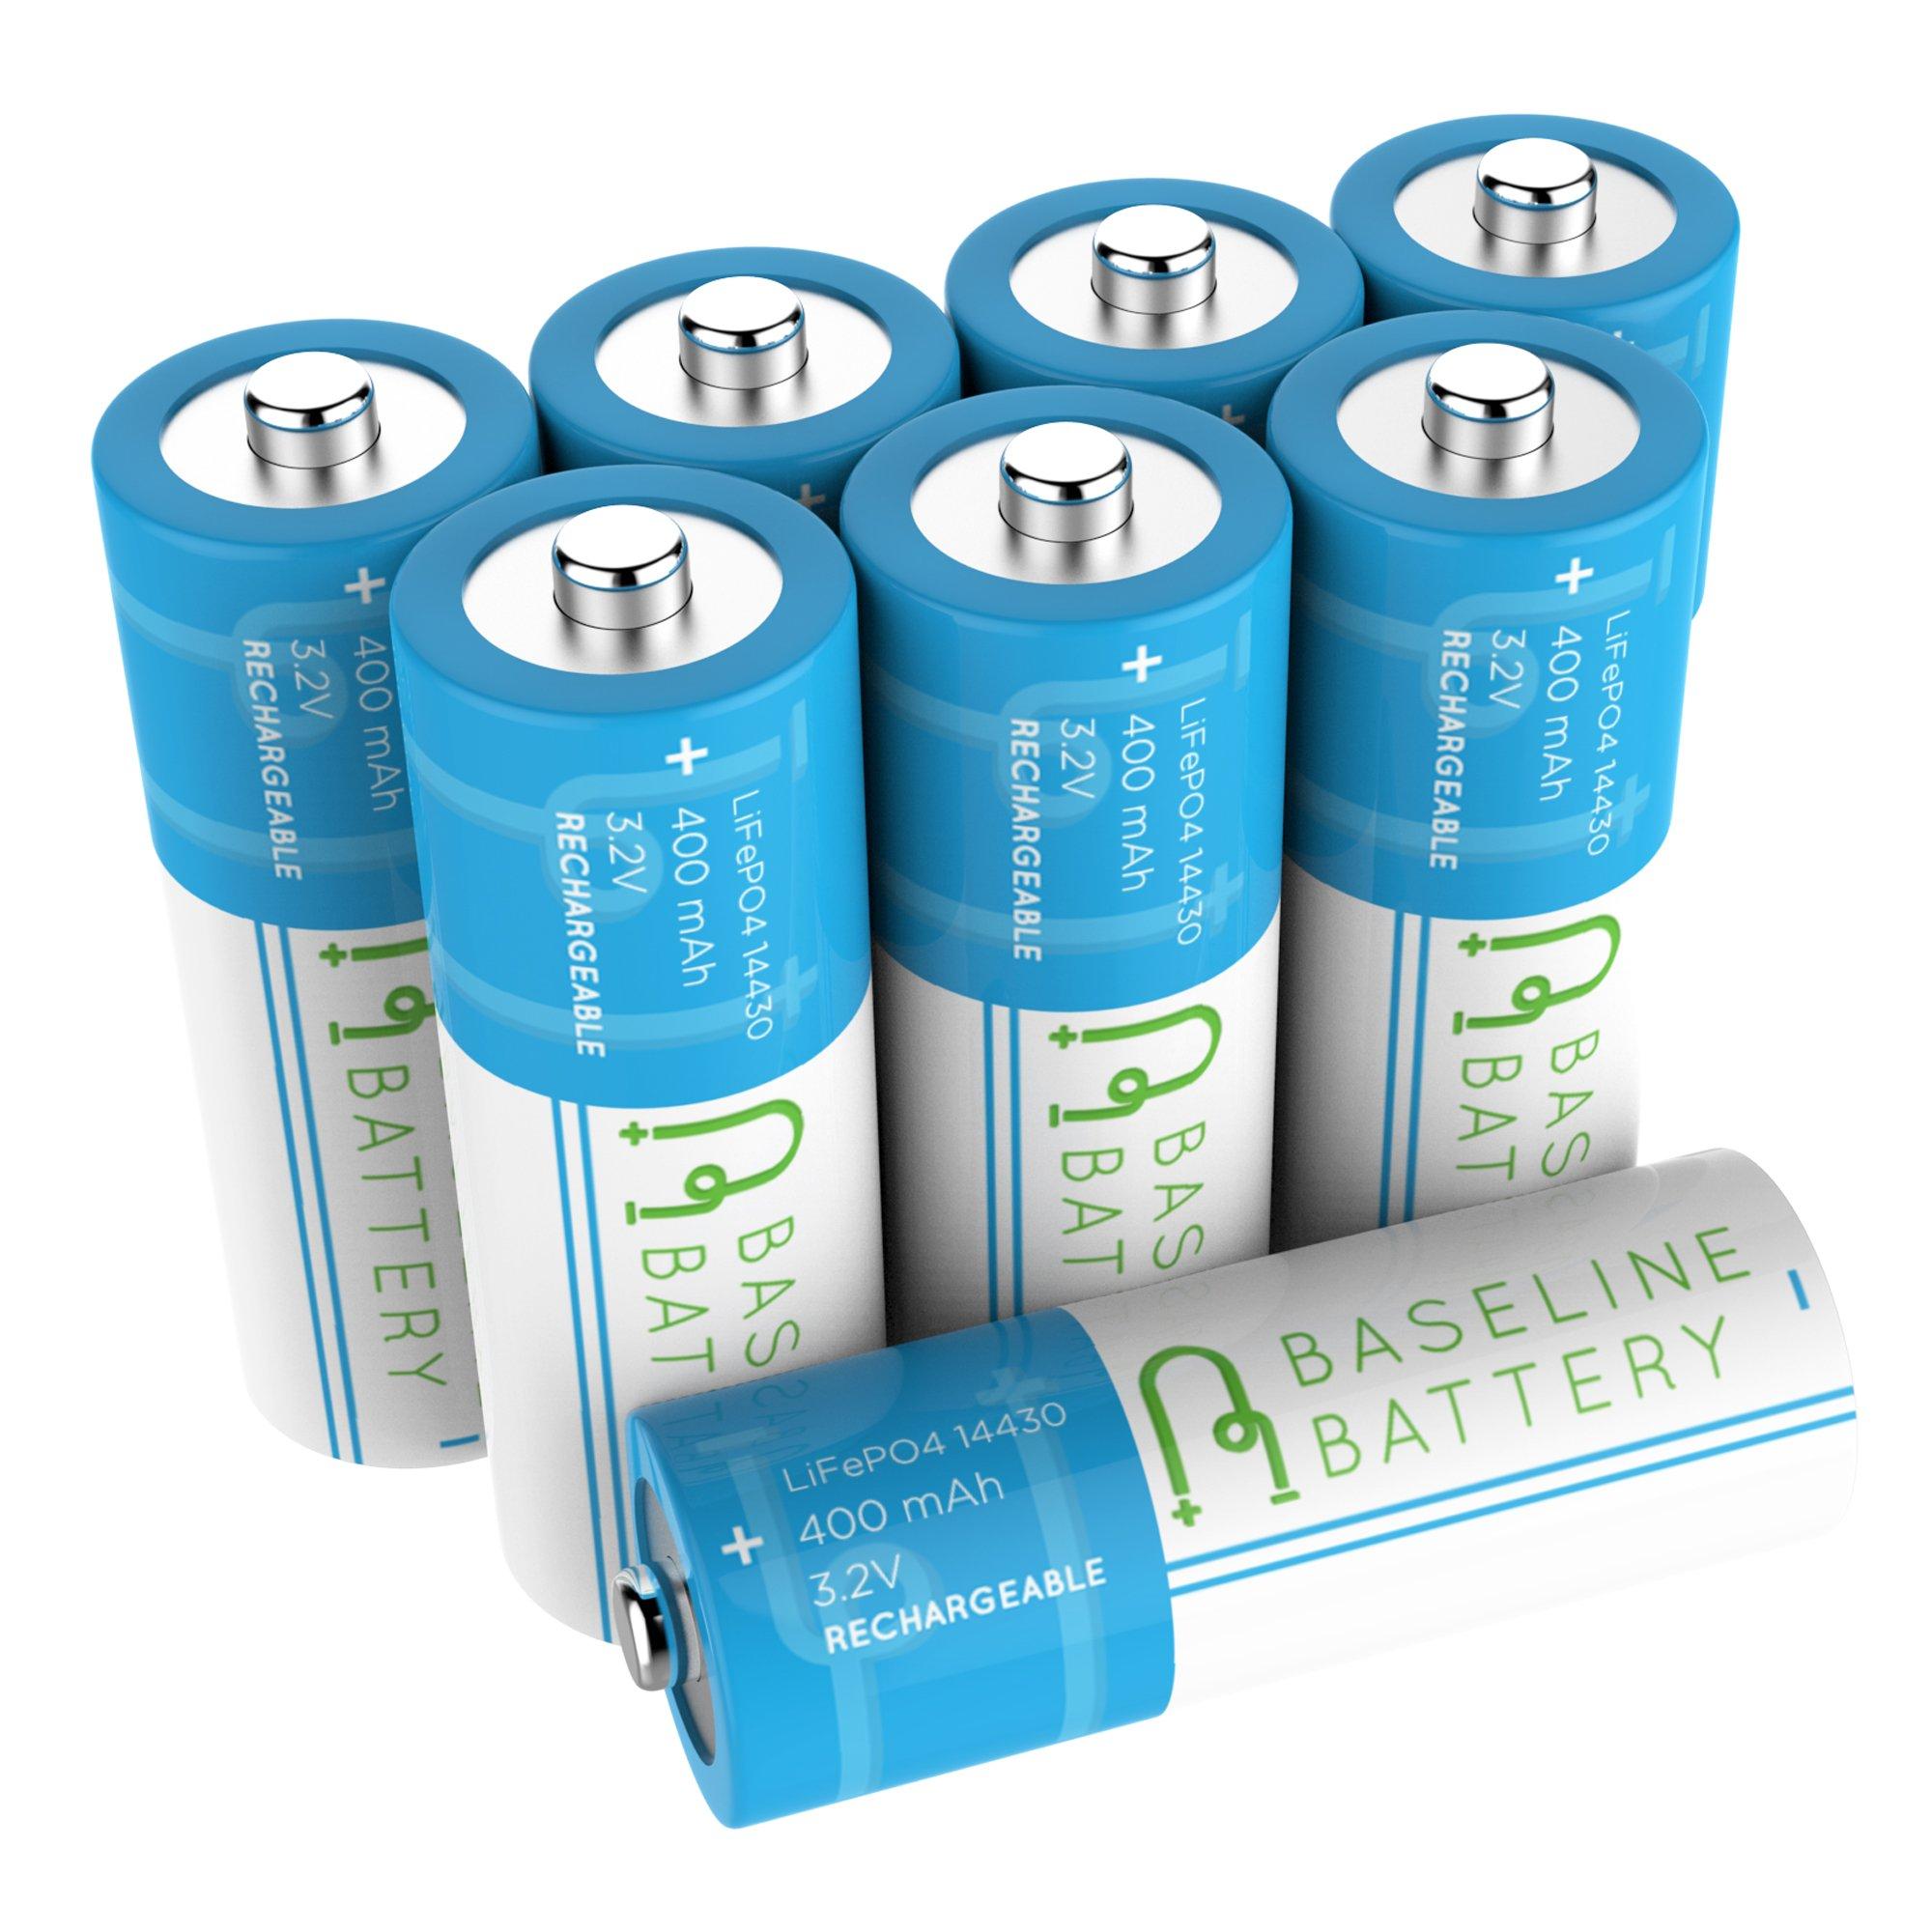 8 IFR 14430 3.2v LiFePO4 Lithium Phosphate Rechargeable Batteries 400 mAh Solar Garden Light Baseline Battery